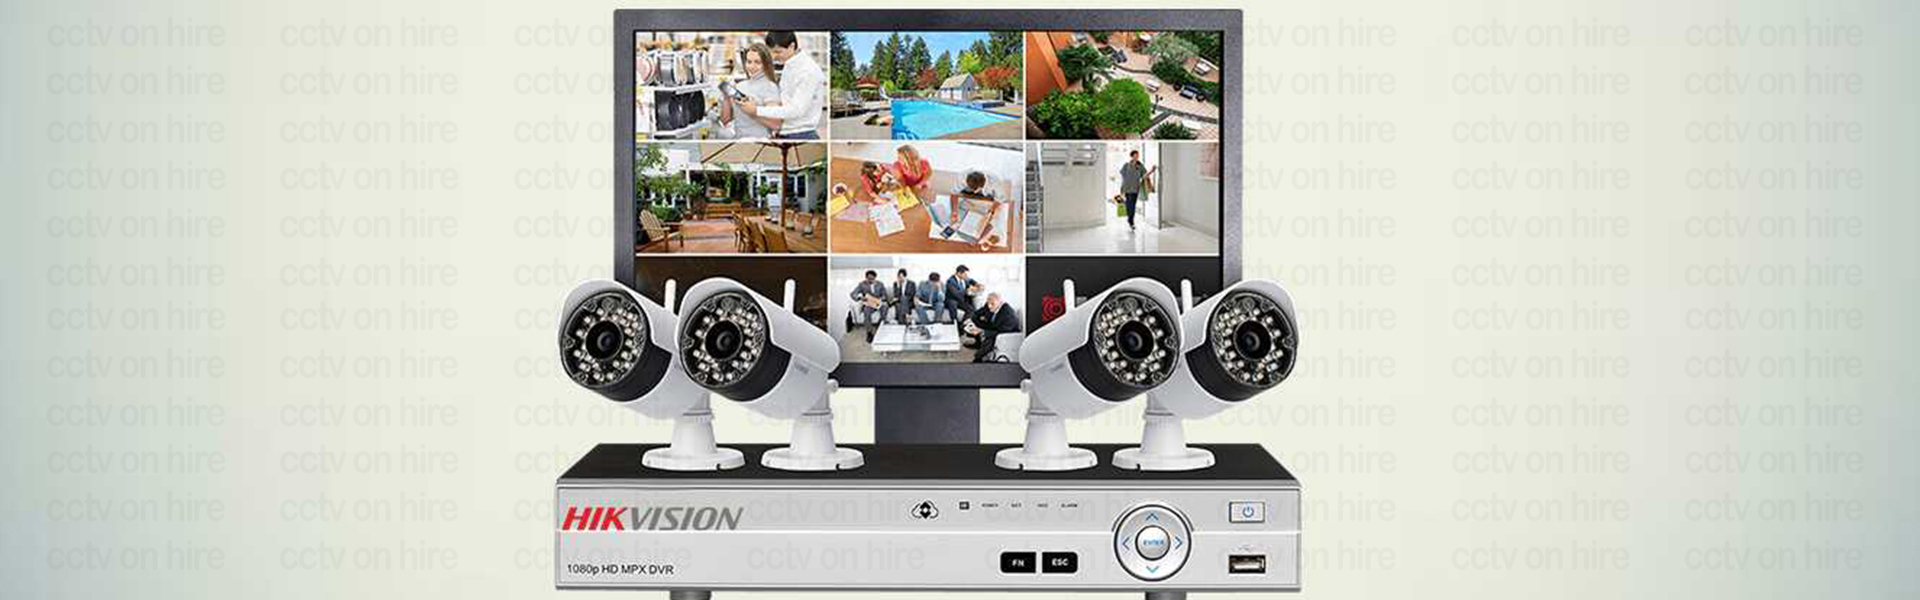 CCTV camera maintenance services Delhi